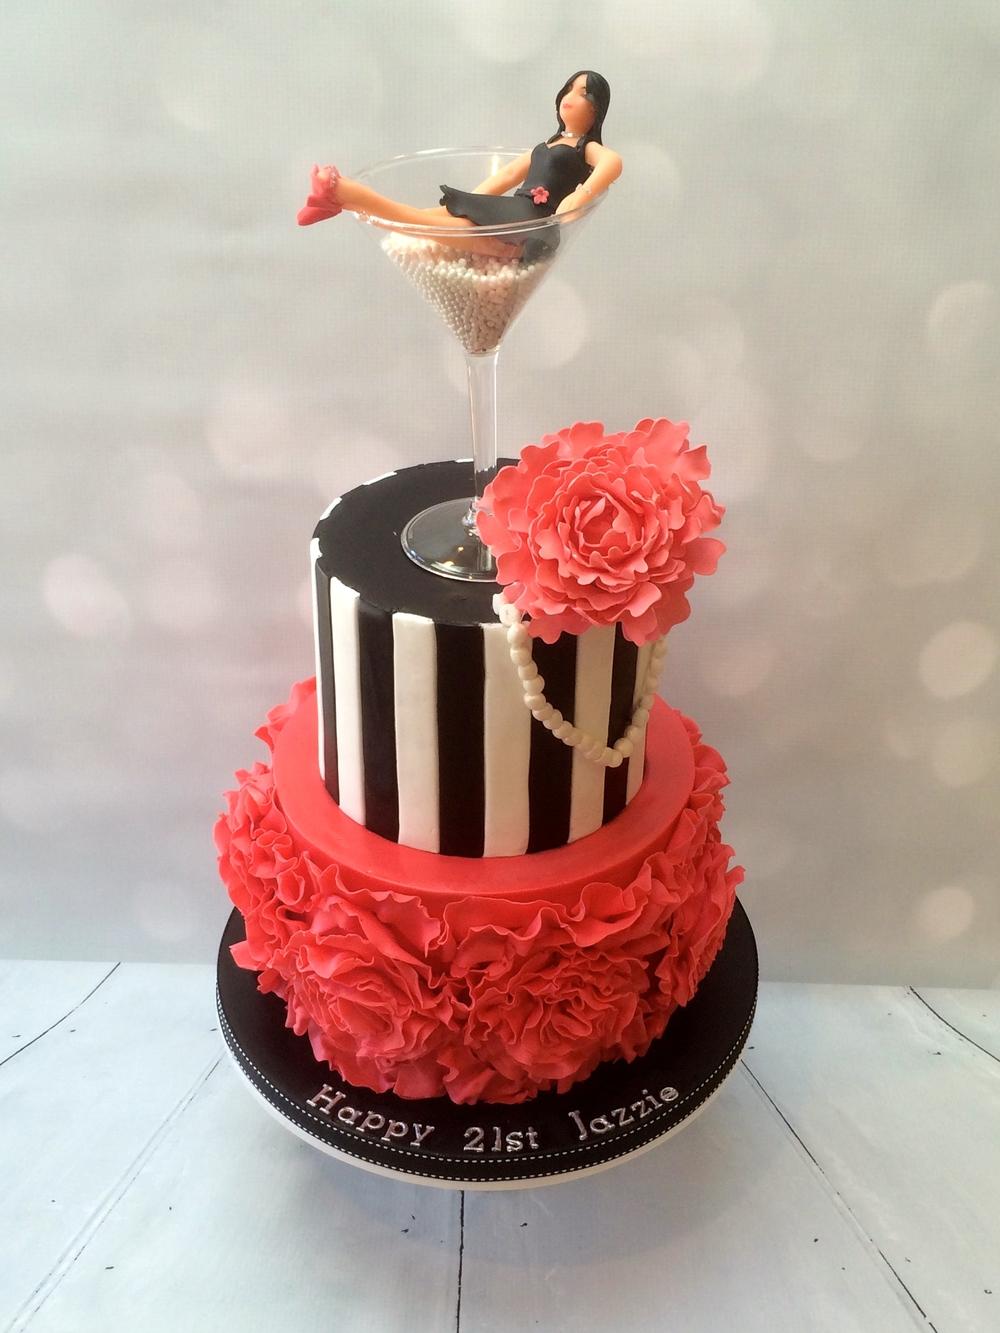 21st Birthday Martini Glass Cake Louise Sandy Custom Cakes